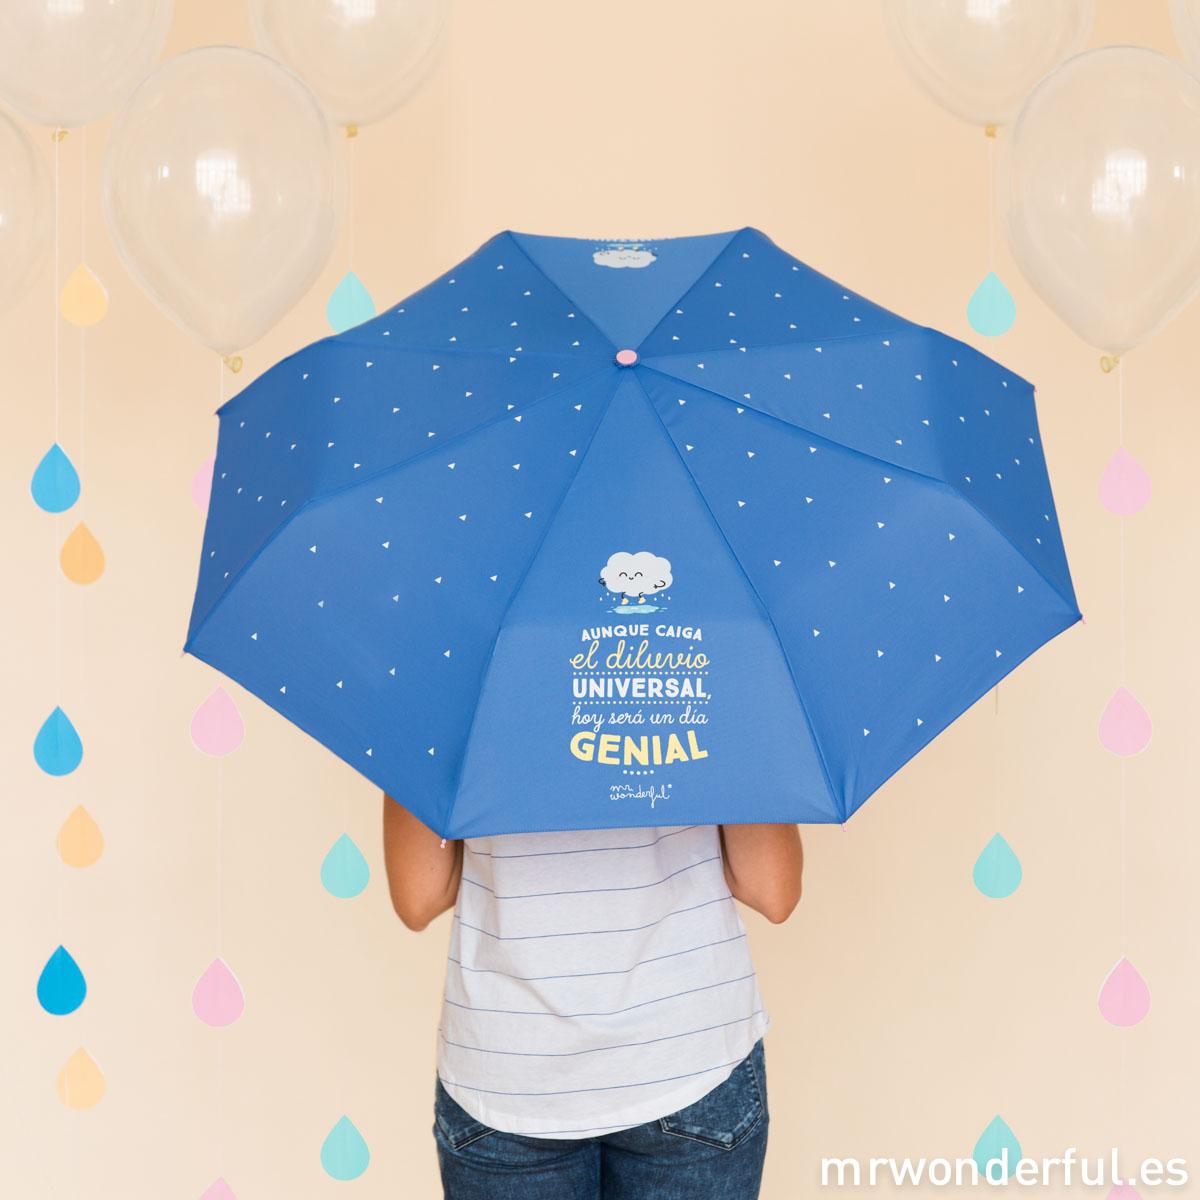 mrwonderful_8435460706872_paraguas_aunque-caiga-el-diluvio-universal-hoy-sera-un-dia-genial-ES-3